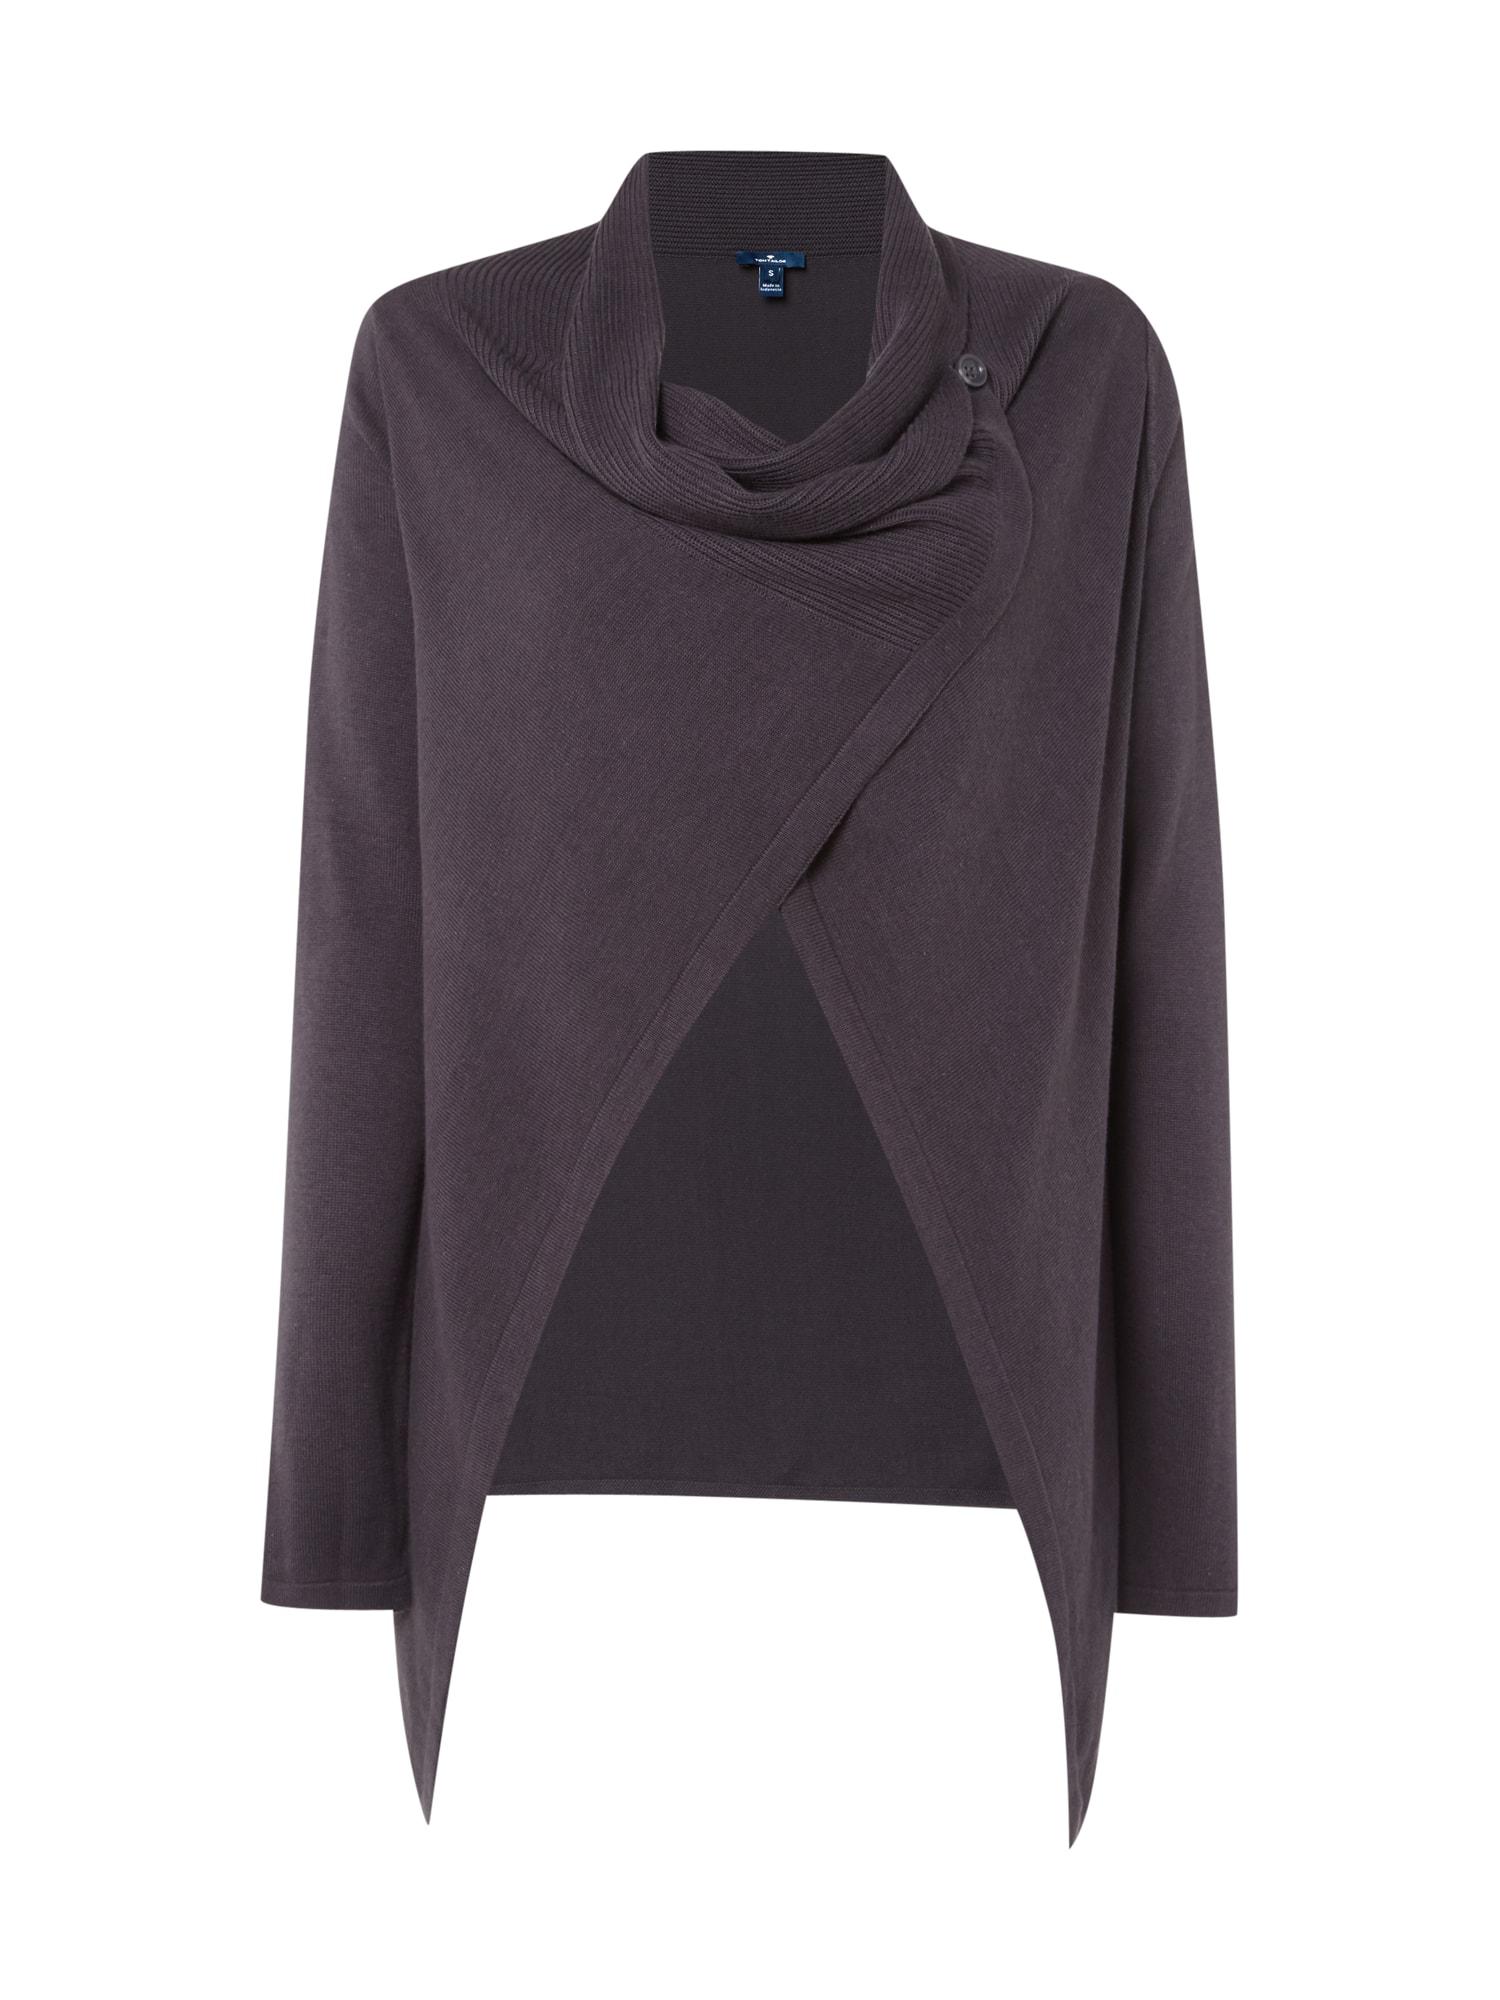 a7f0b0701cd340 Pullover, Strickjacken & Sweatshirts TOM TAILOR Damen Poncho Strick Ponchos  & Capes